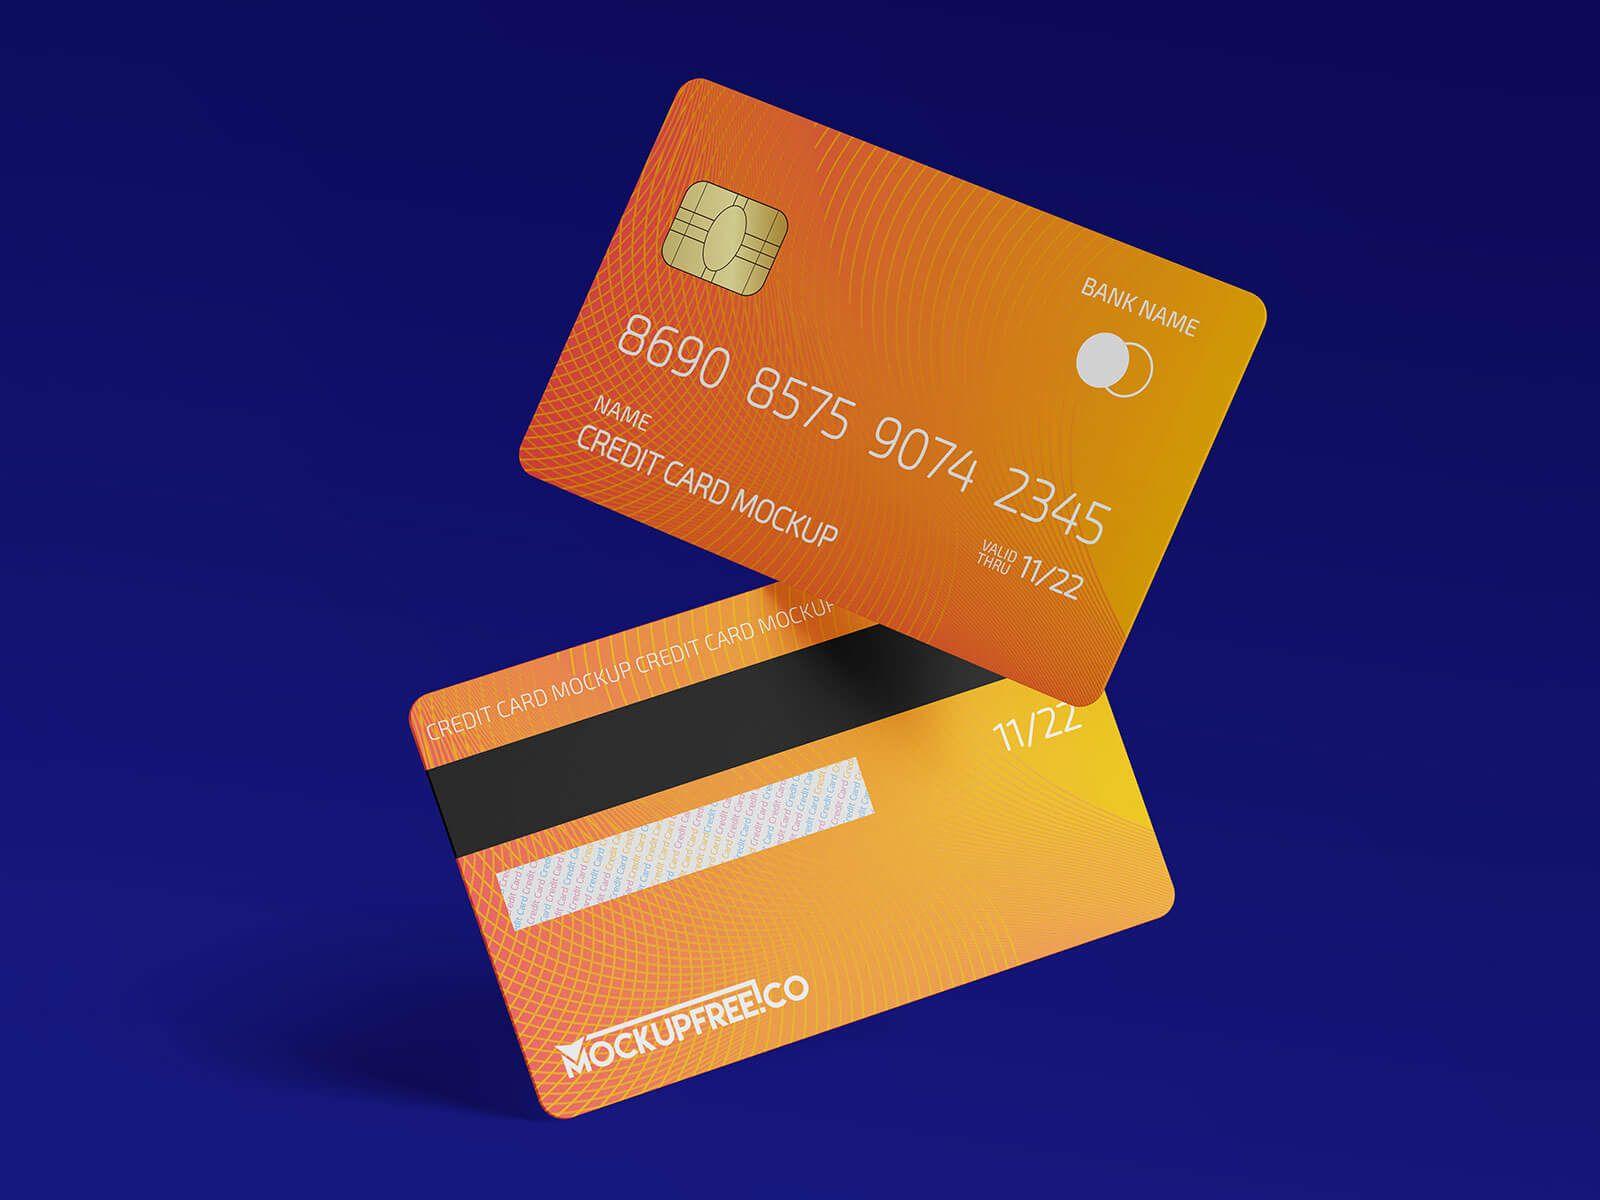 Free Plastic Credit Debit Bank Card Mockup Psd Set Good Mockups Business Cards Mockup Psd Bank Card Business Card Mock Up